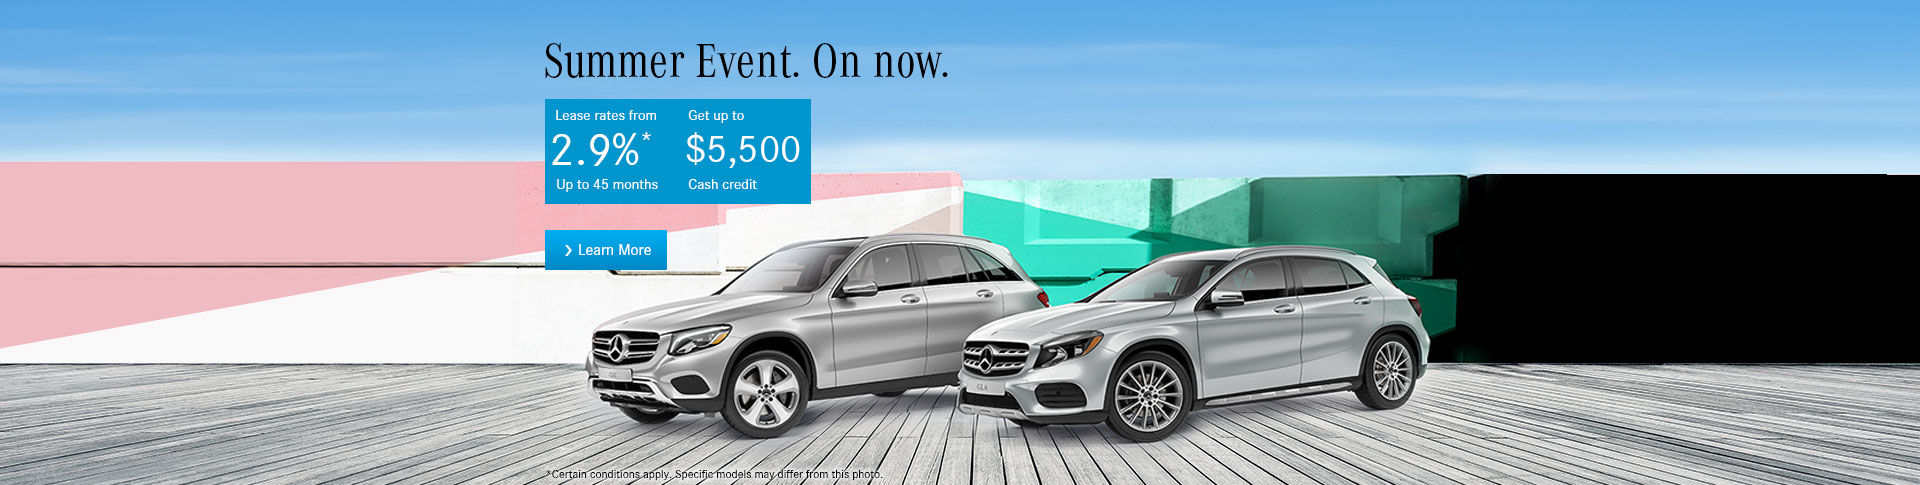 Mercedes-Benz Summer Sales Event